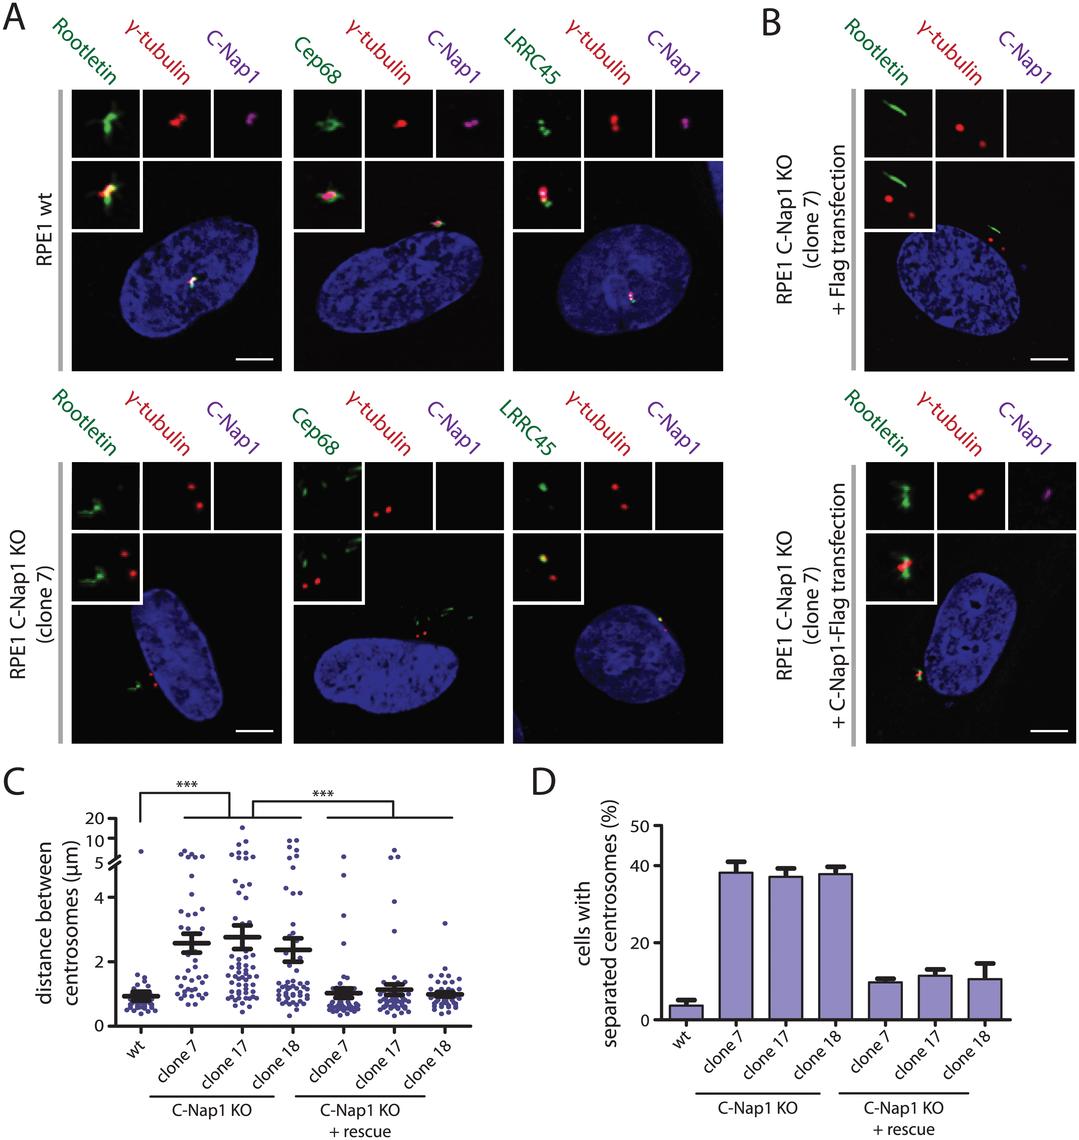 Centrosomes of RPE1 C-Nap1 KO cells lack a centrosomal linker, yet they are kept relatively close together.